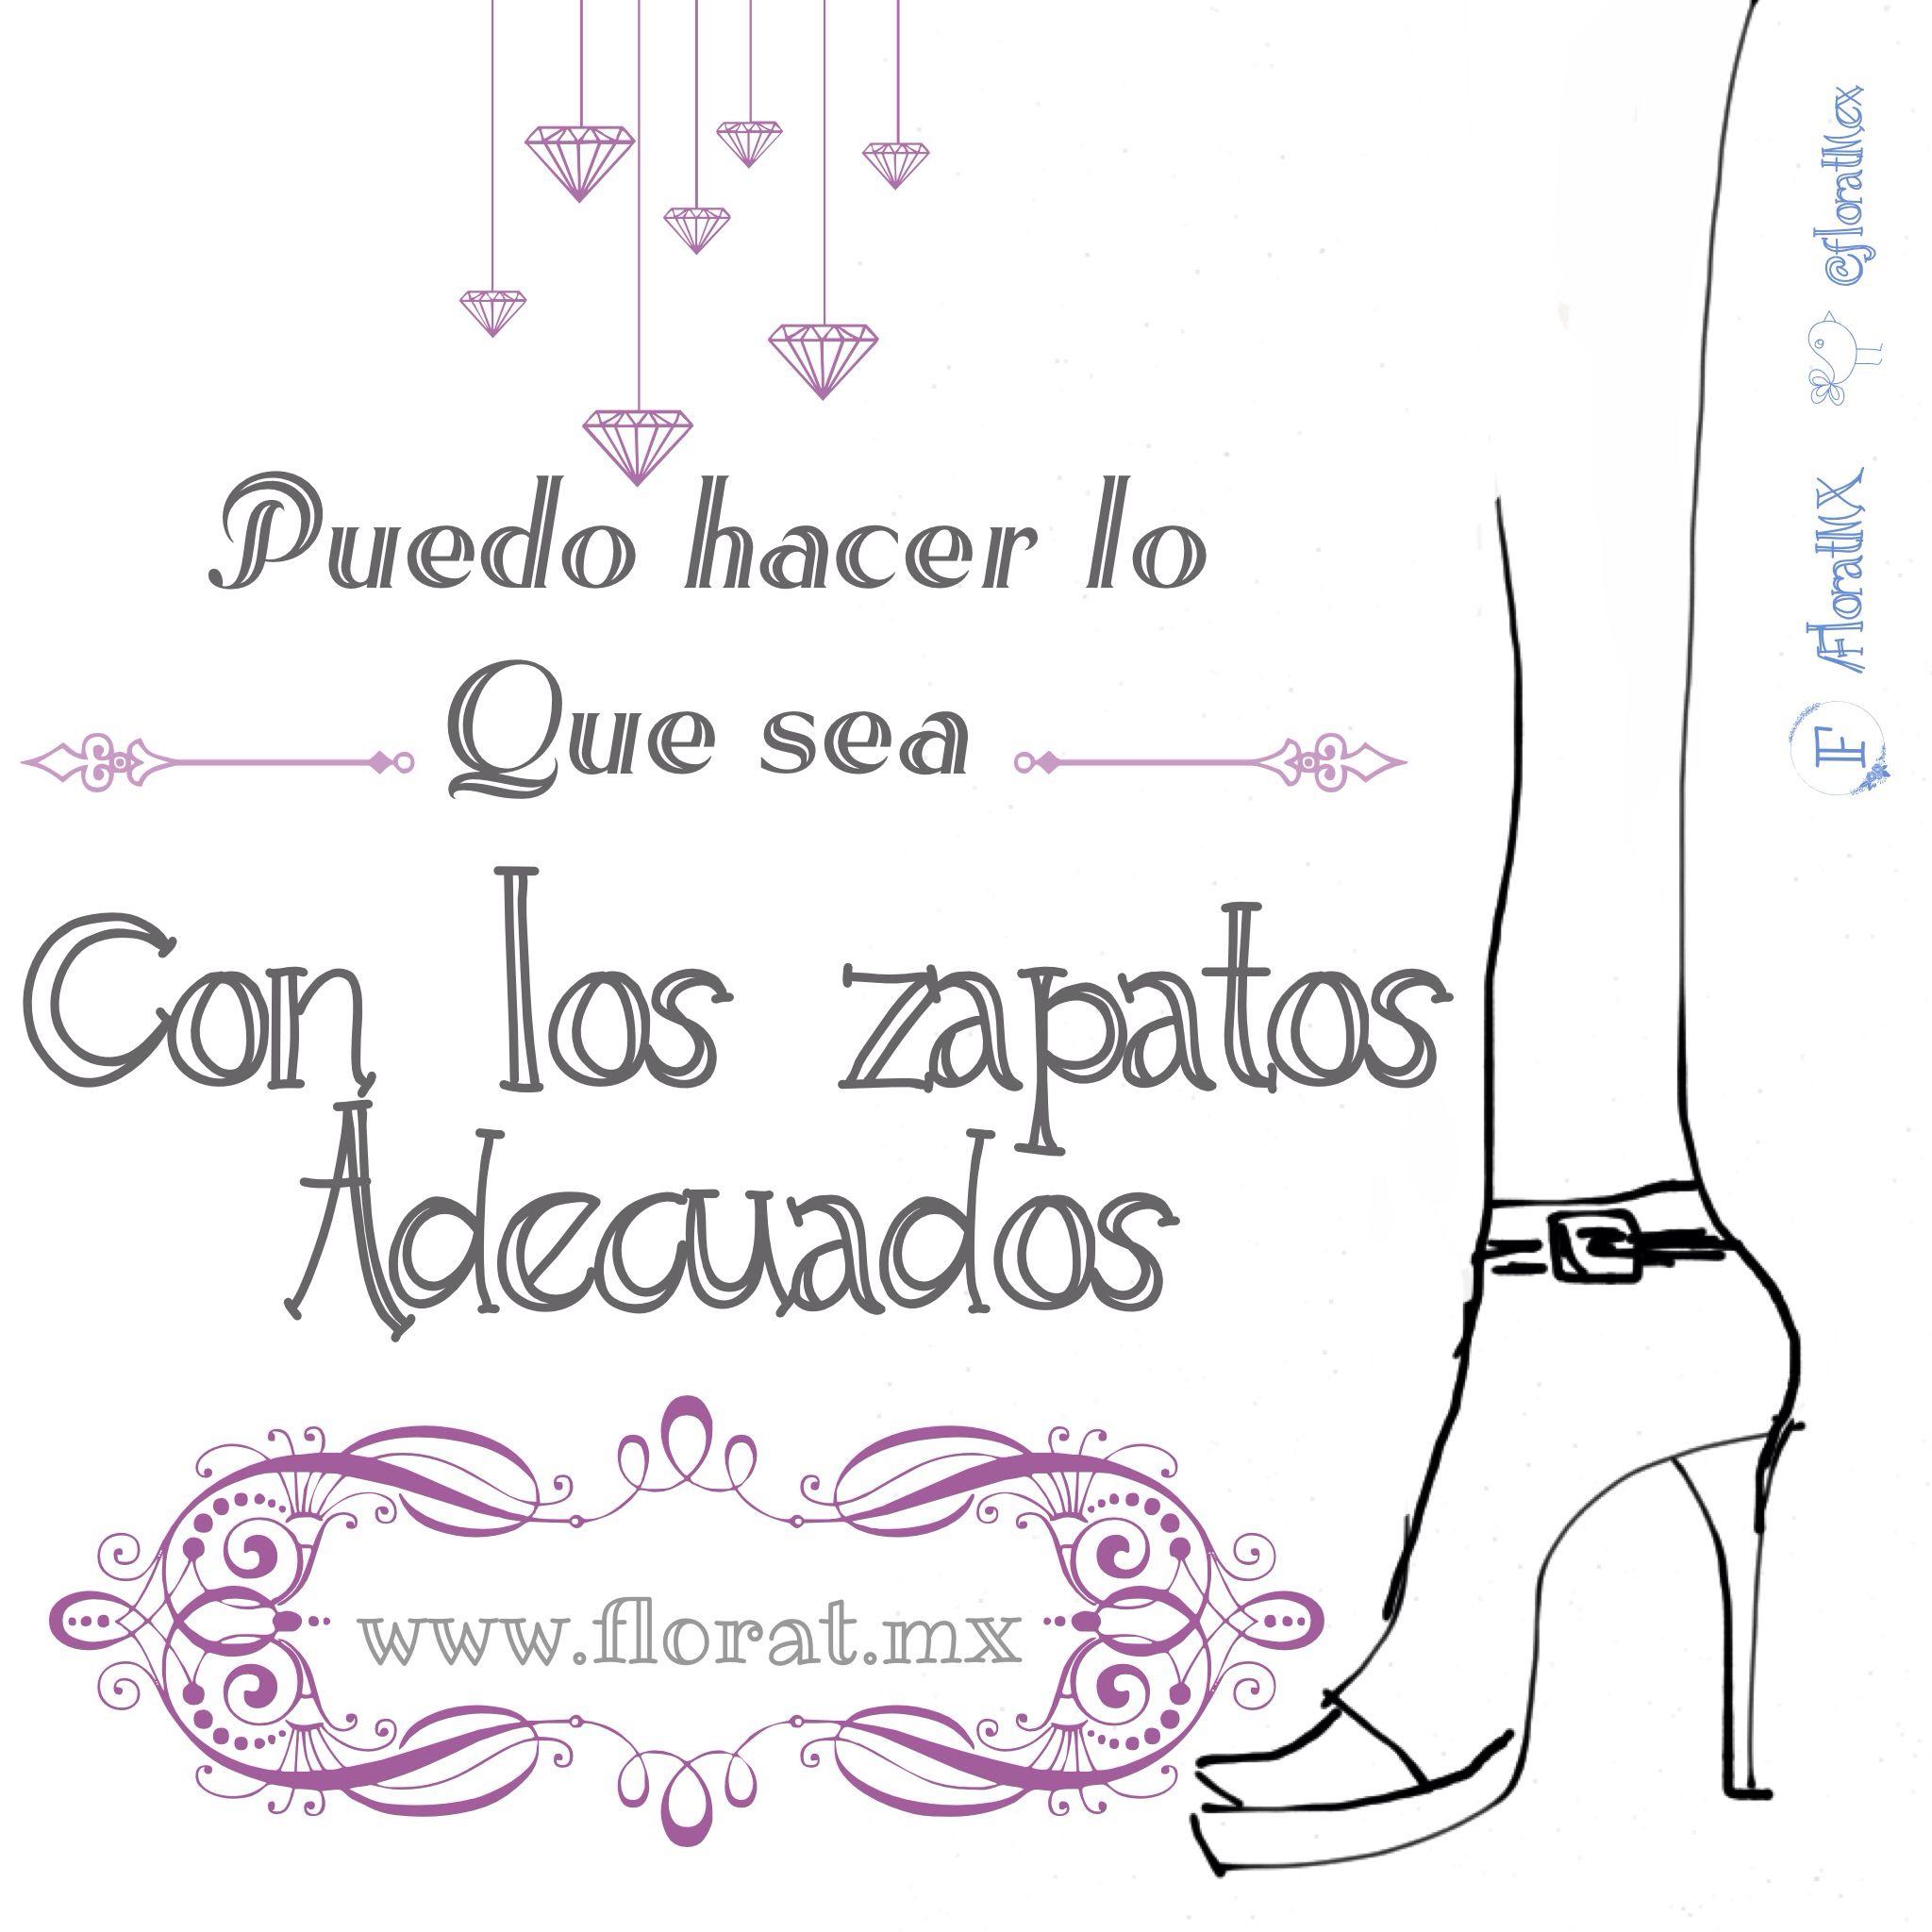 #estilo #outfit #blogger #mexicanblogger #sales #mexico #streetstyle #streetstylemx #stylegirl #modanacional #diseñomexicano #hechoenmexico #hechosamano #florat #zapatos #shoes #tacones #flats #balerinas #love #instagood #cute #photooftheday #beatiful #girl #like